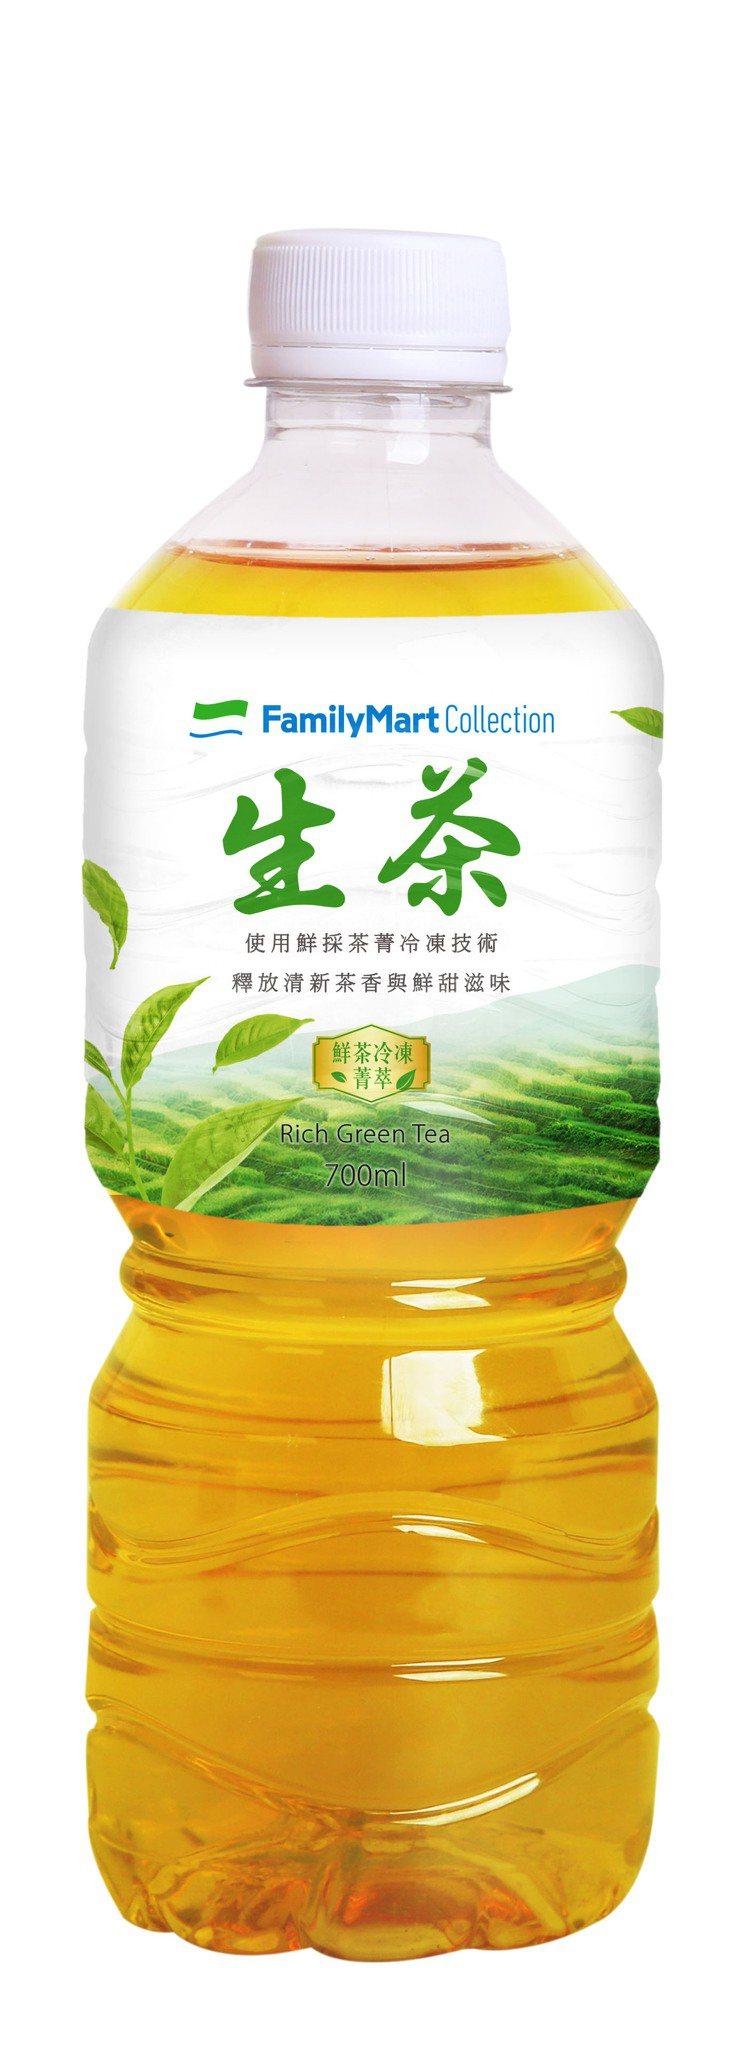 FamilyMart Collection生茶,售價29元。圖/全家便利商店提供